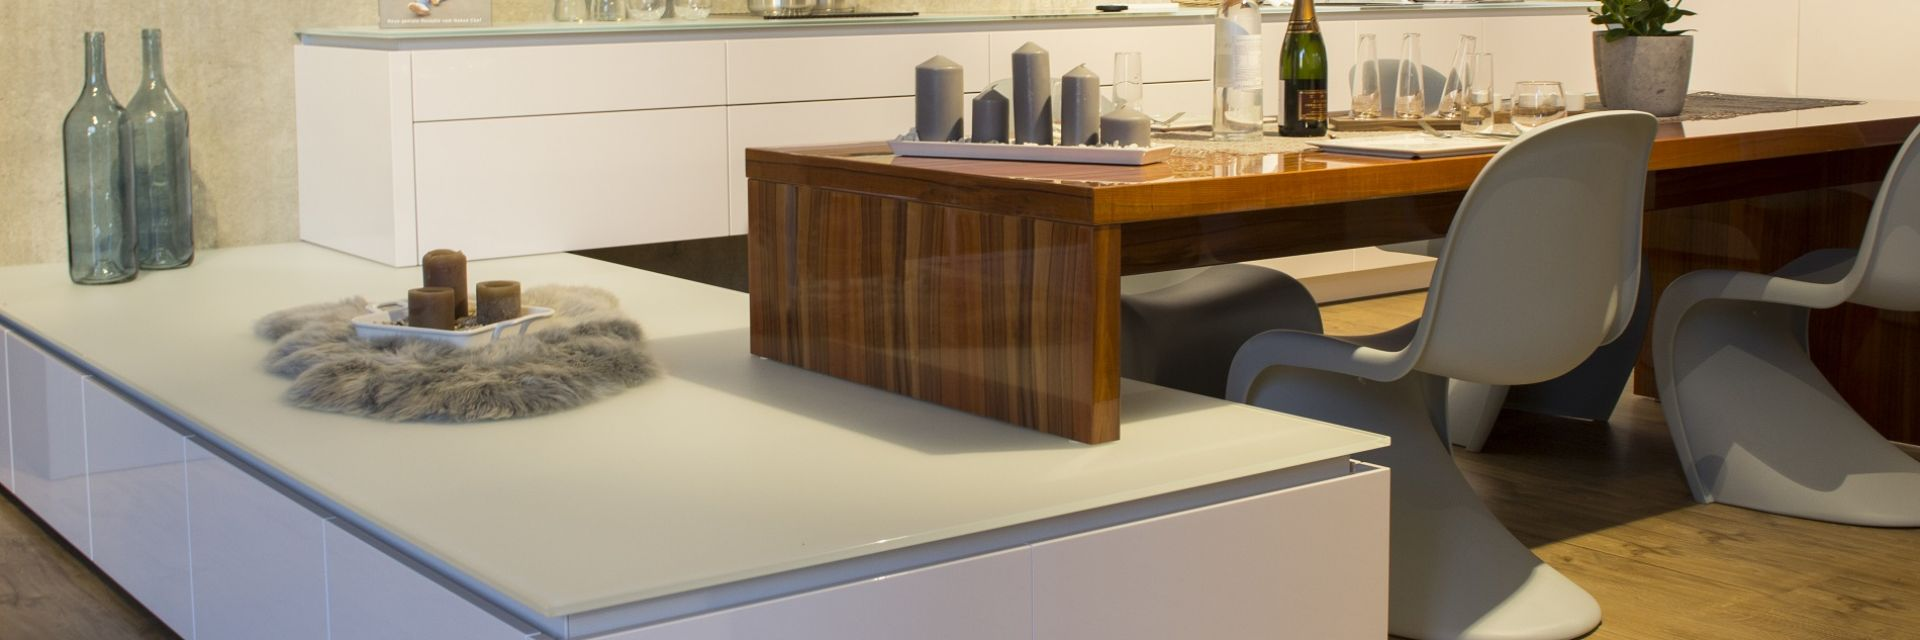 miele maier ravensburg k chen hausger te. Black Bedroom Furniture Sets. Home Design Ideas